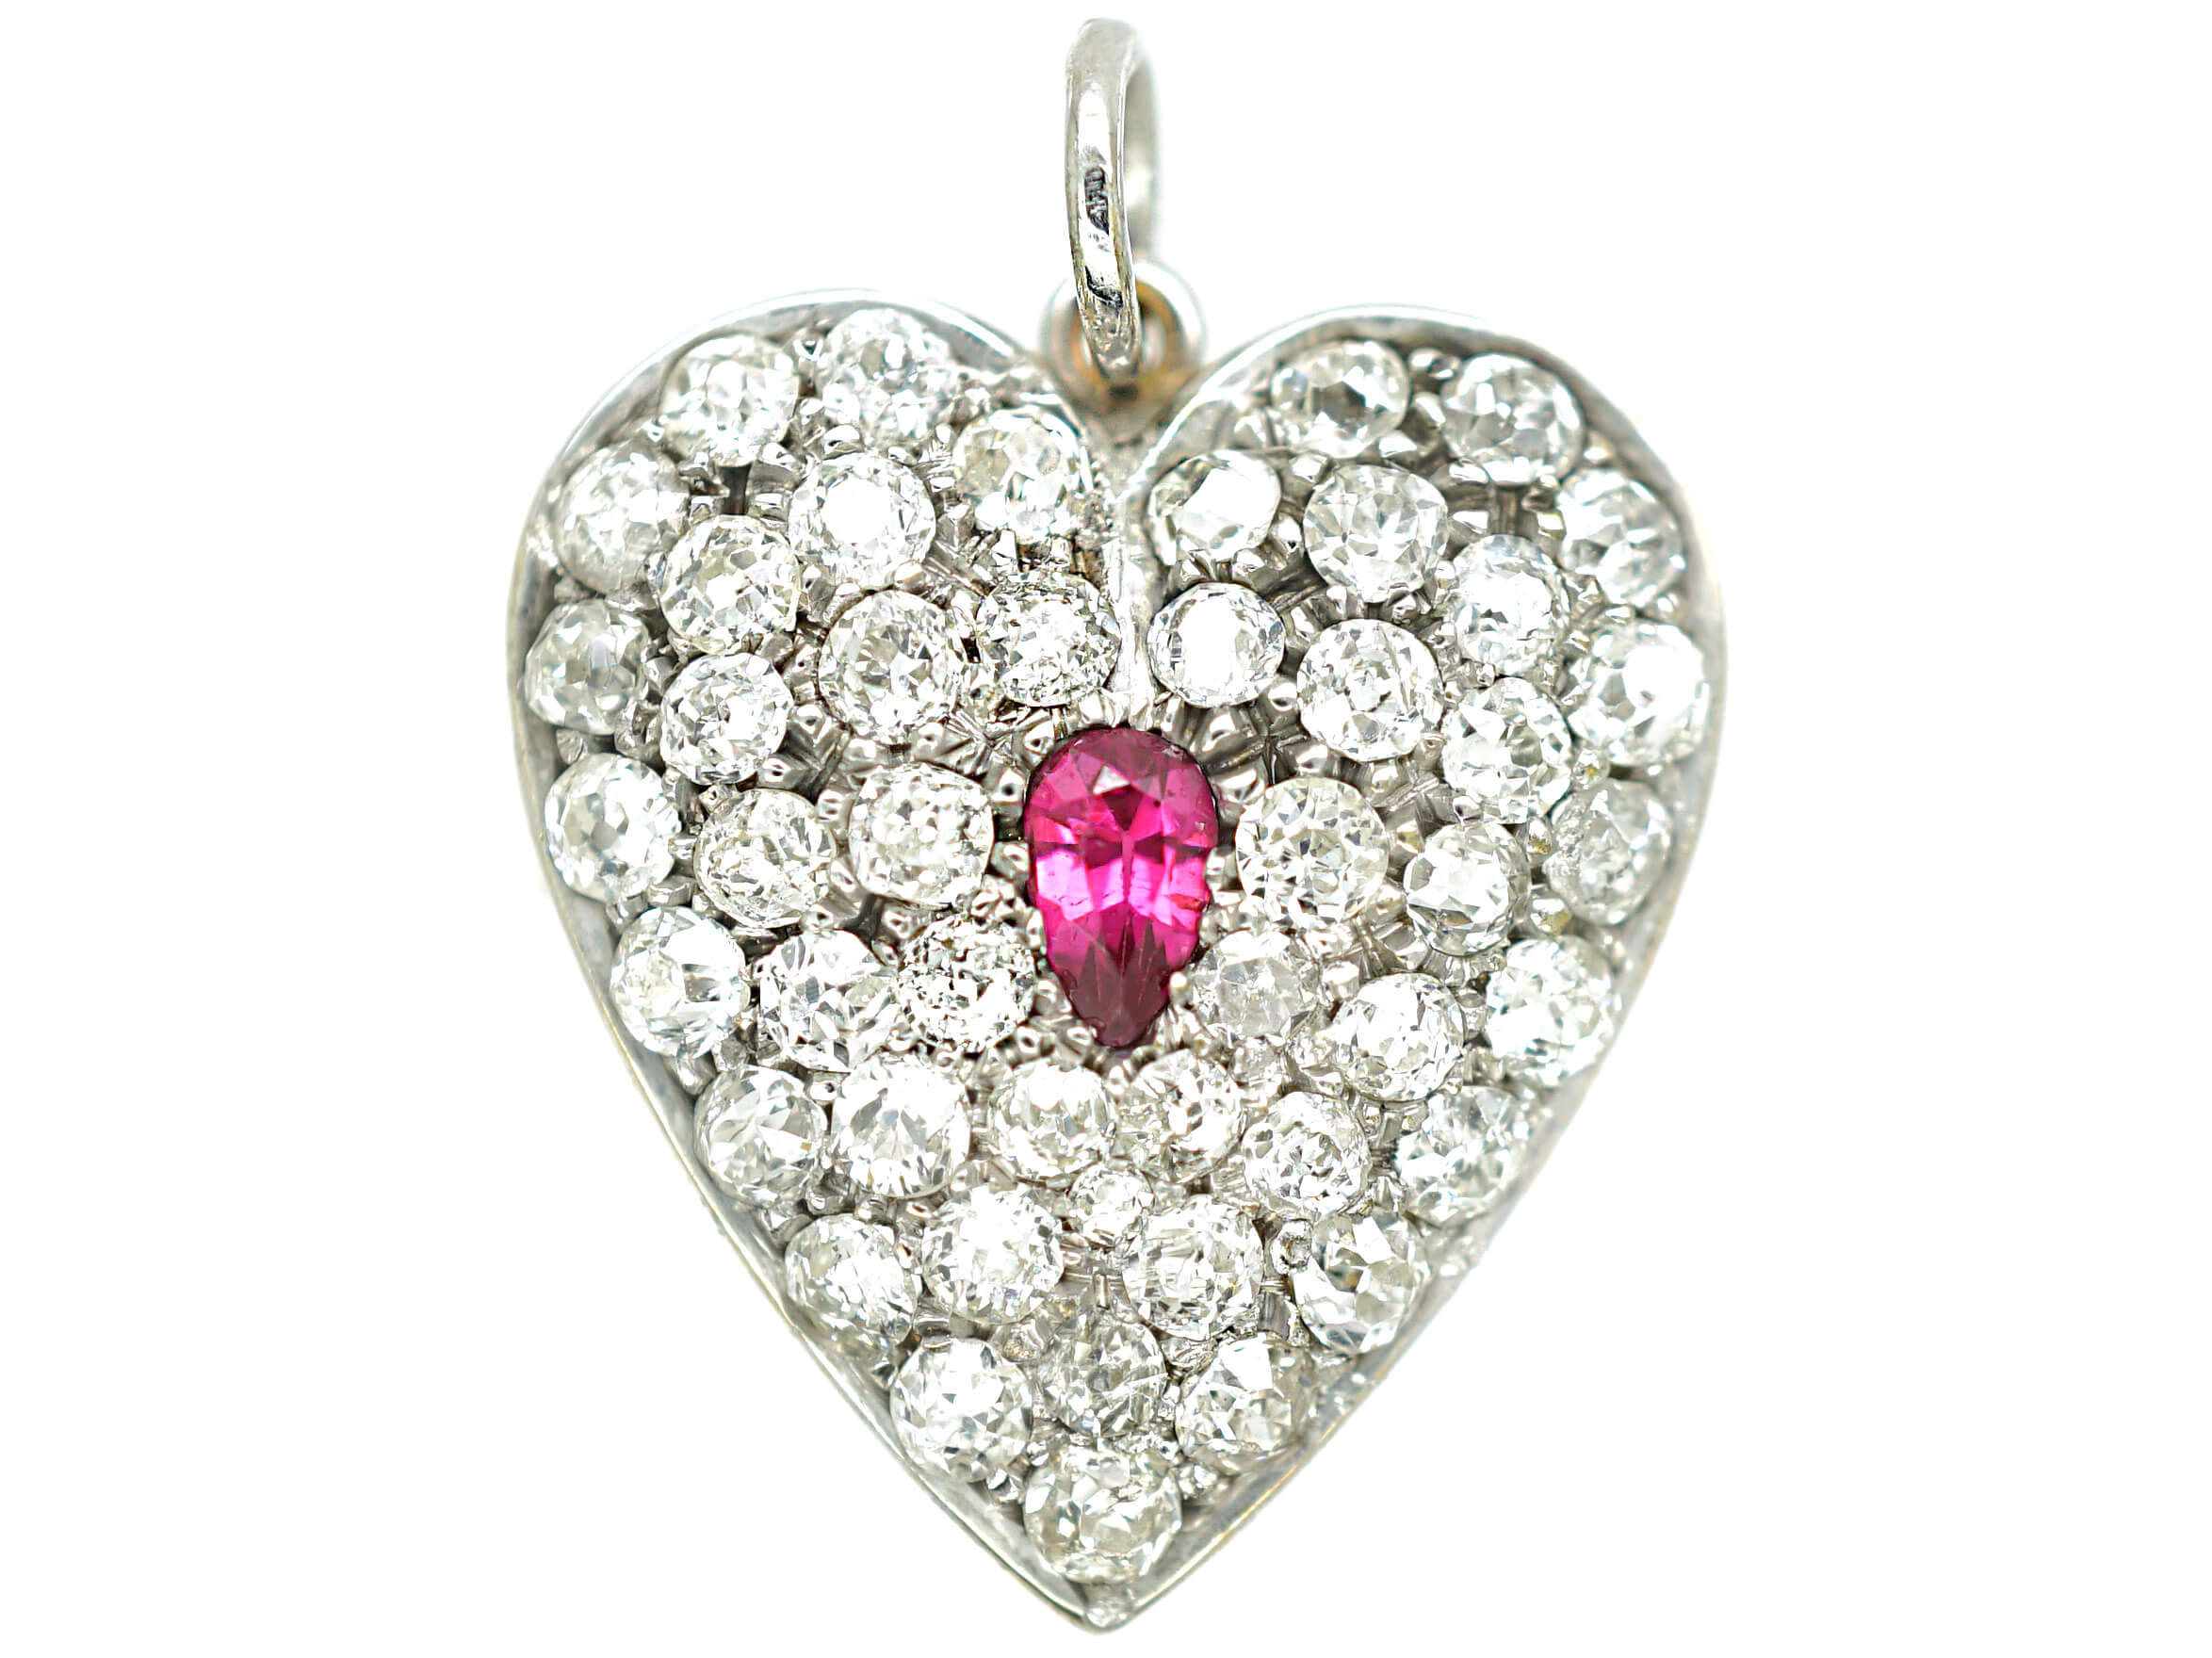 Edwardian 18ct white Gold Ruby & Diamond Heart Shaped Pendant